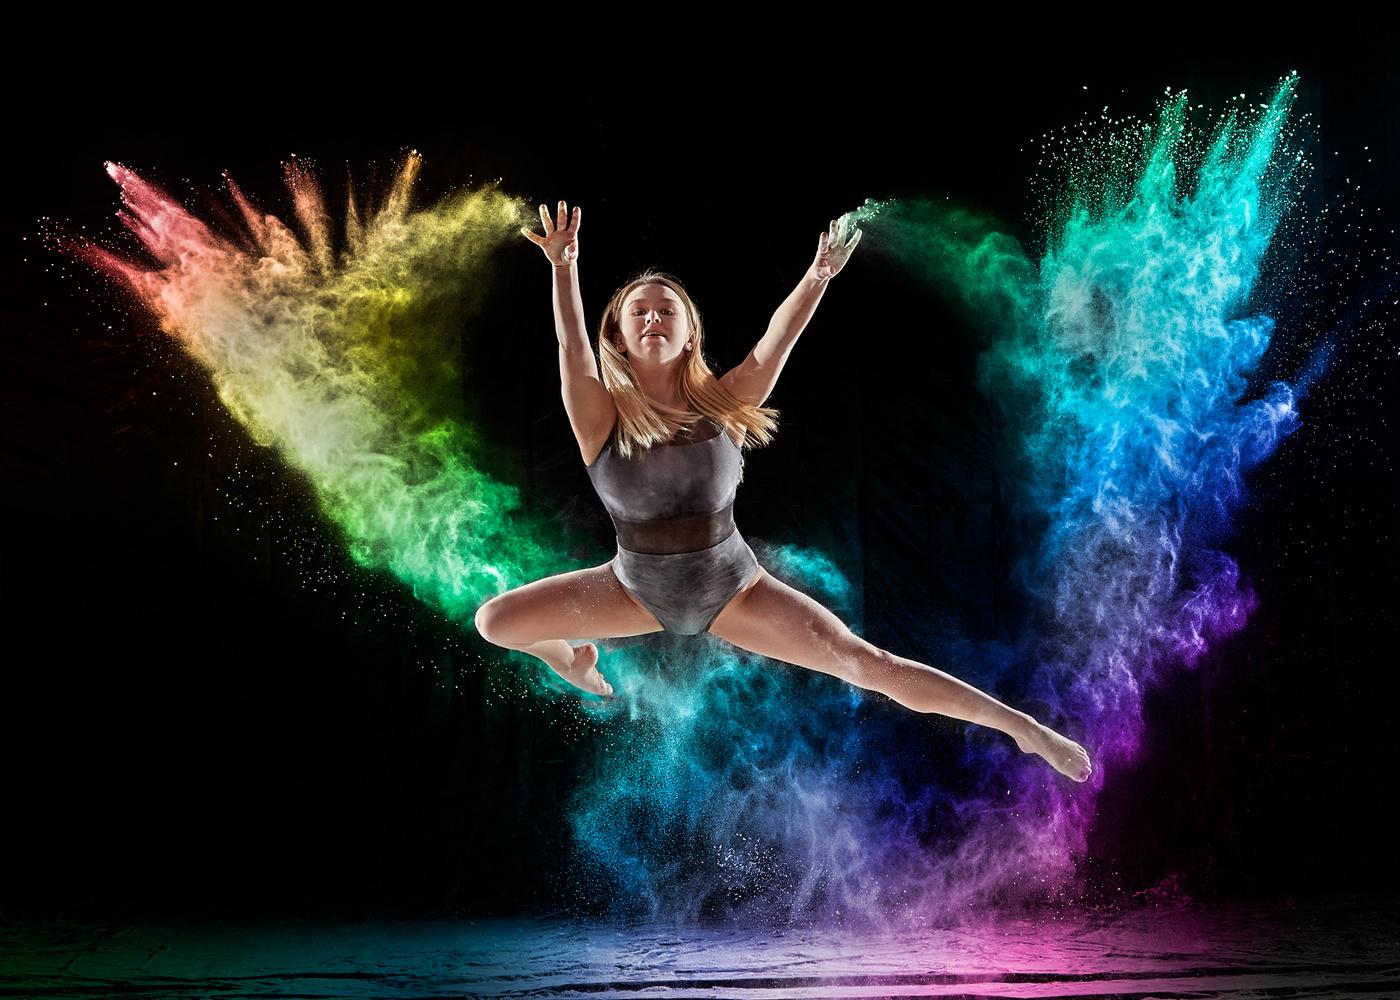 Rainbow Dance by Hank Rintjema